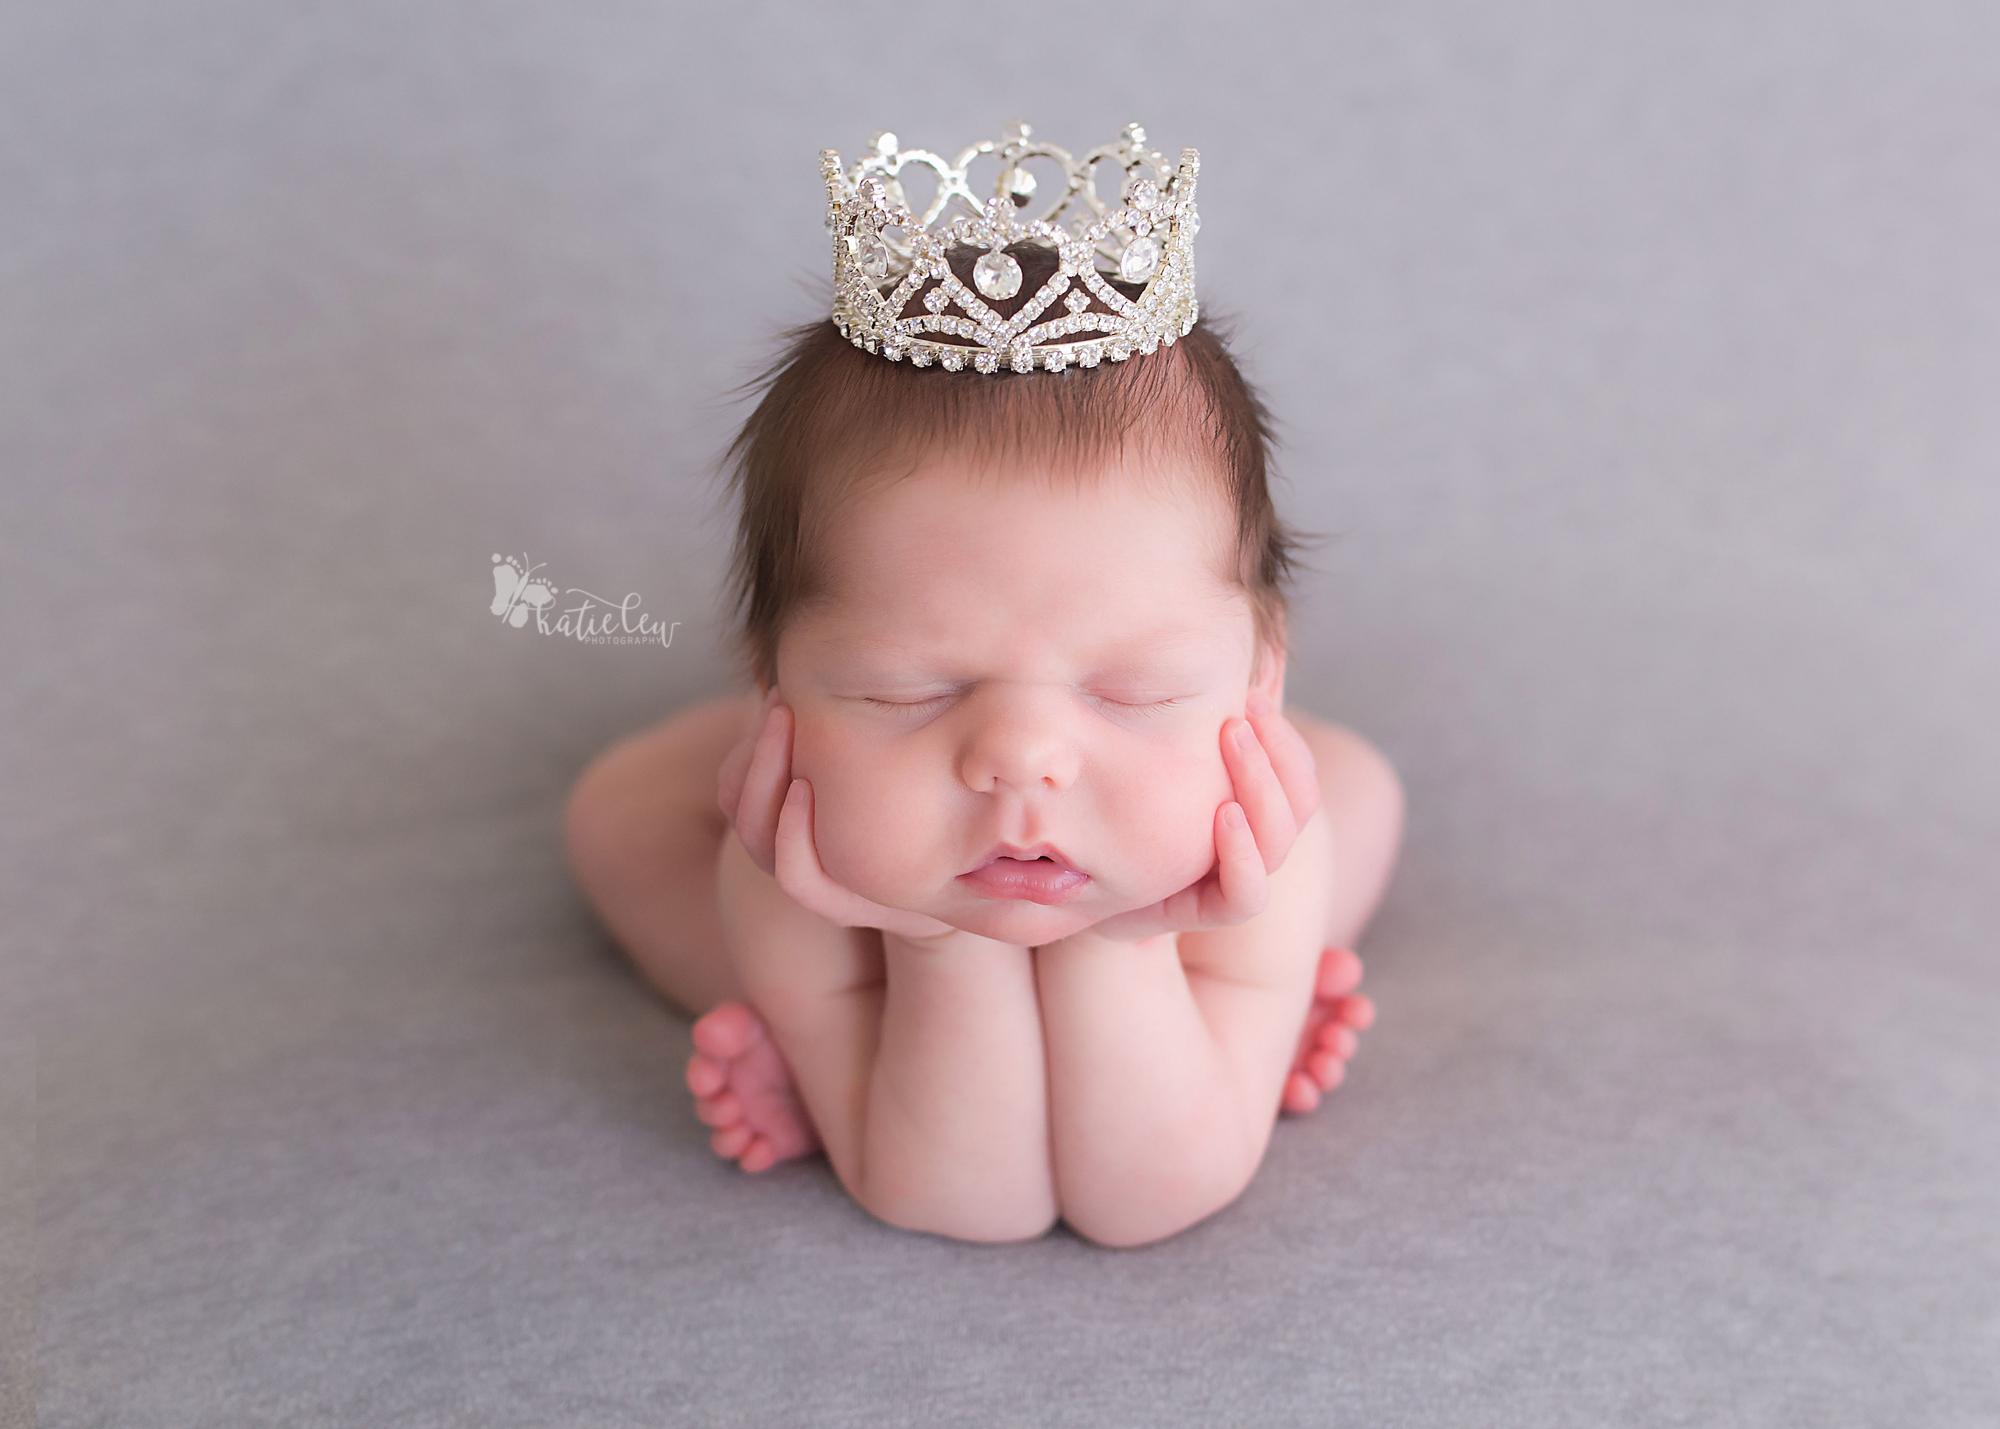 Newborn Mini$285 - Click for more details